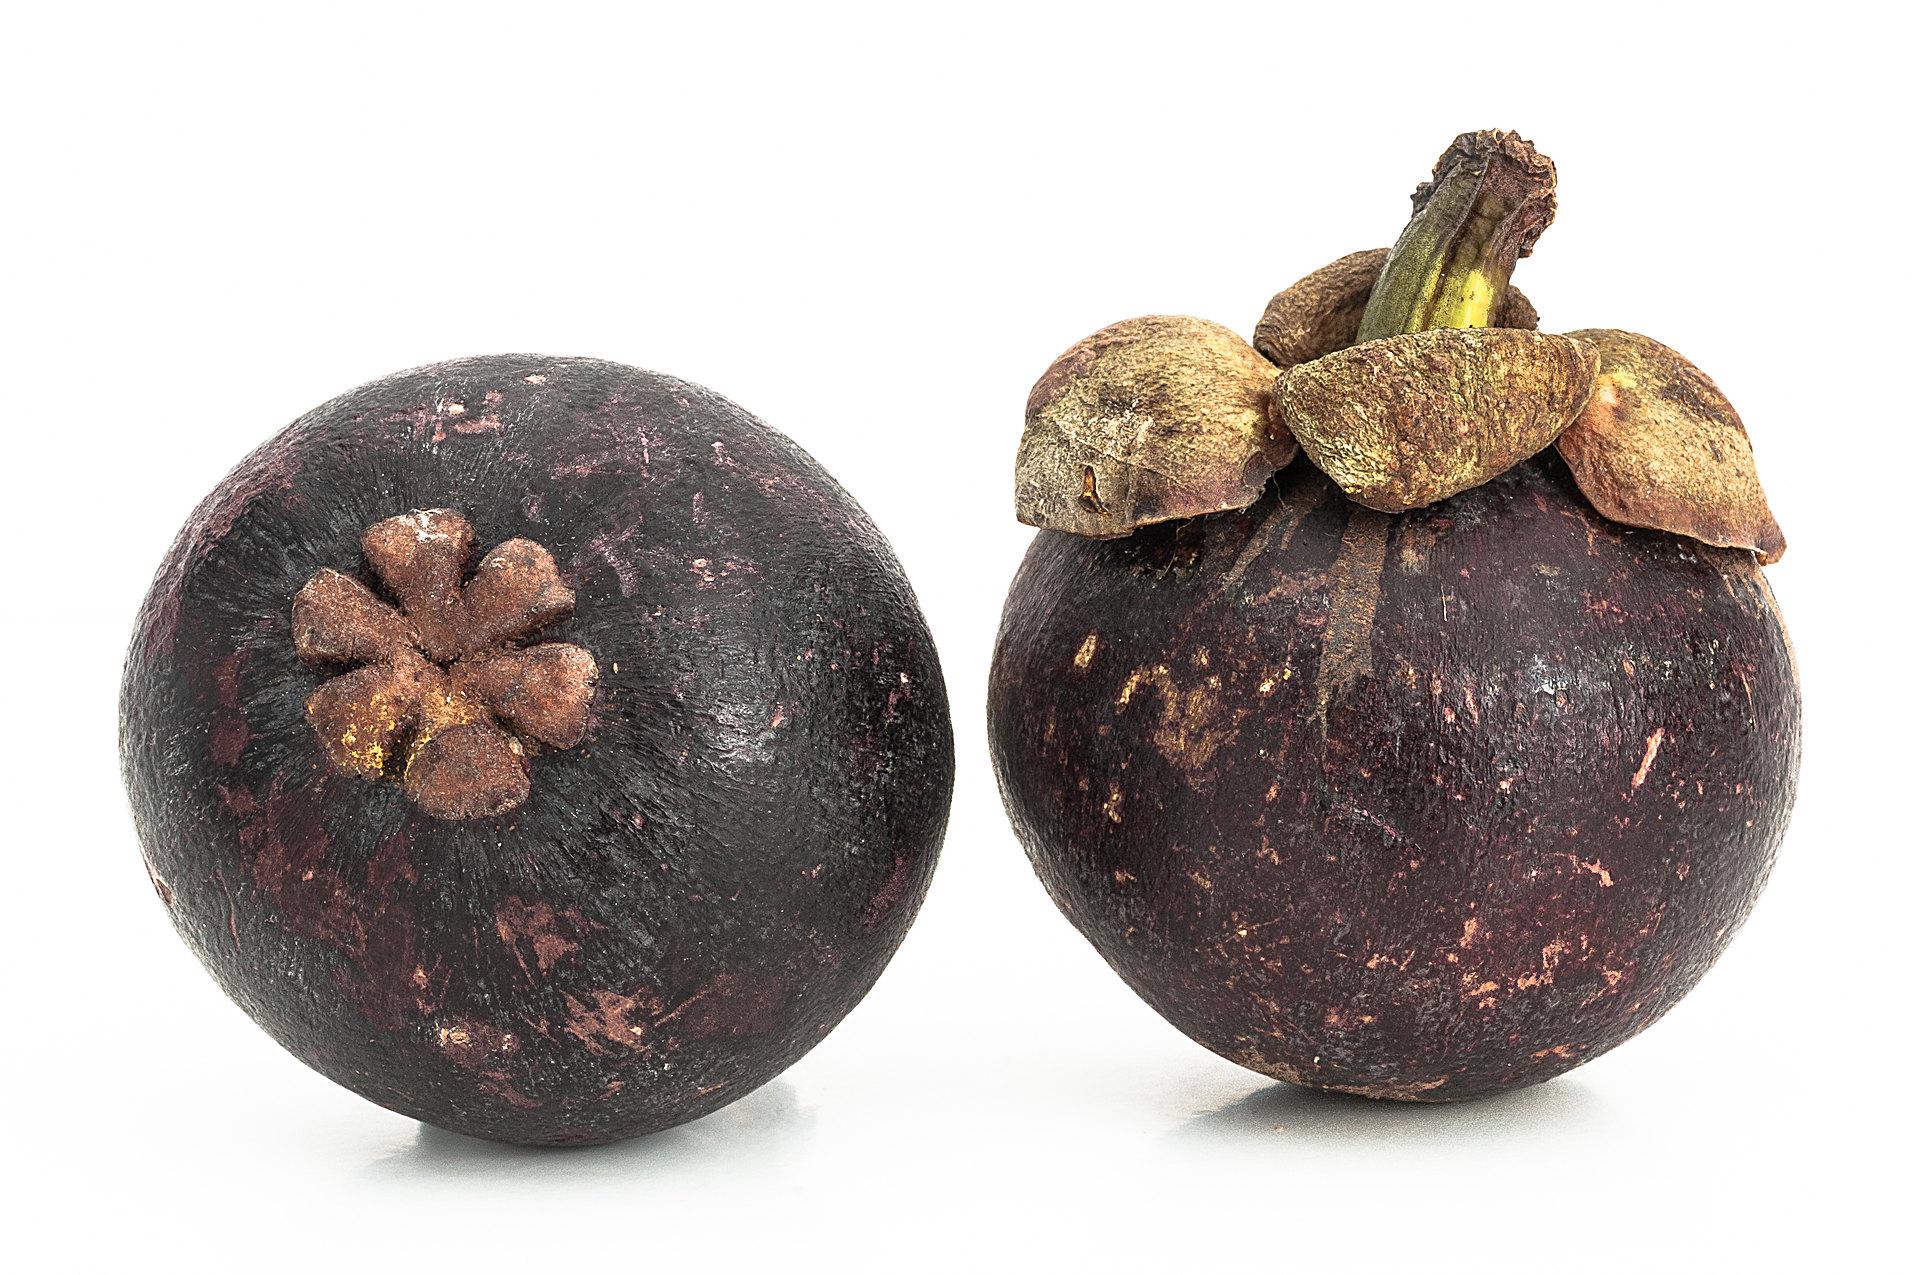 Garcinia mangostana - Mangostane